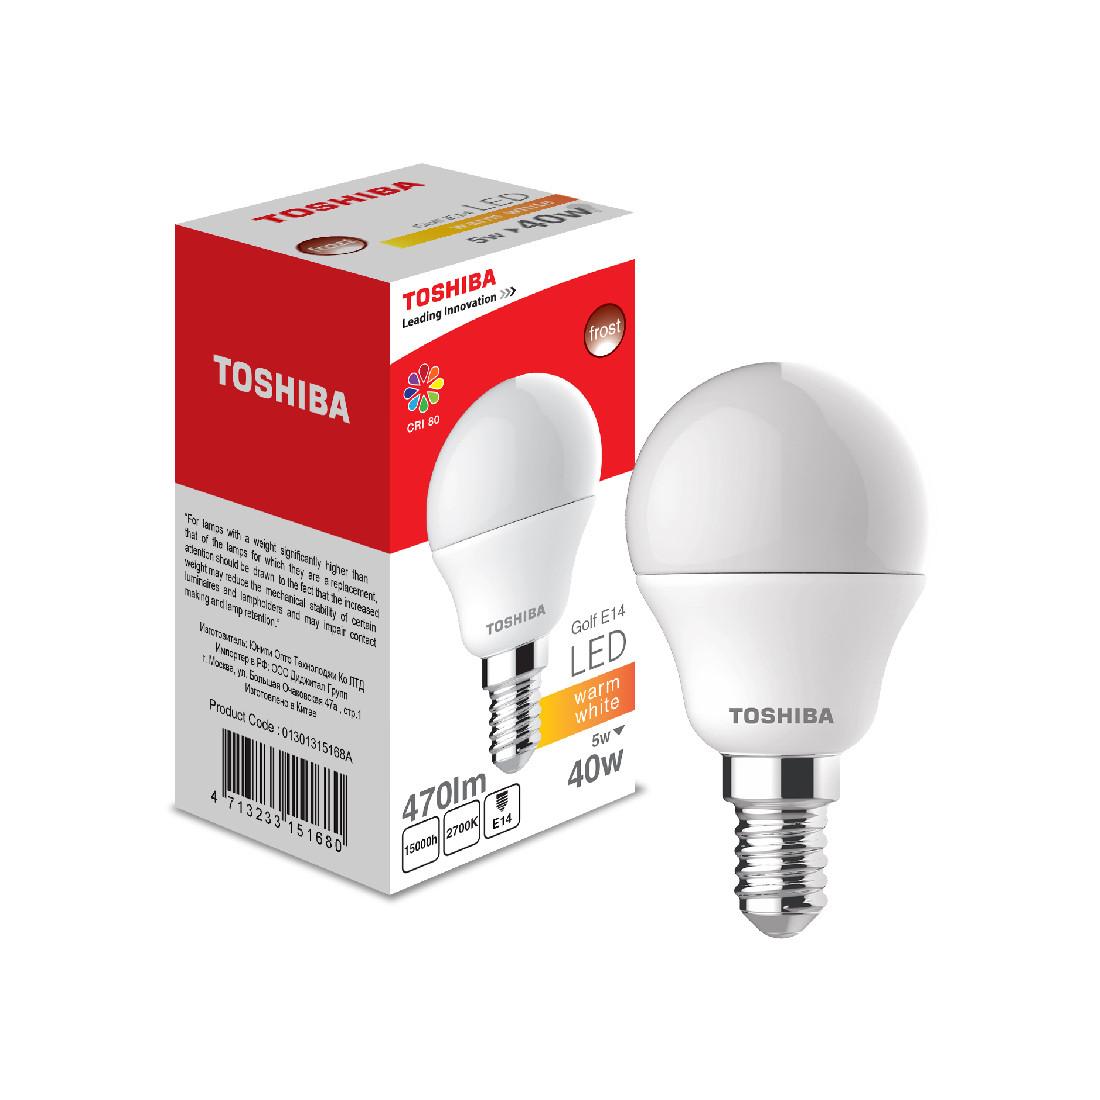 Светодиодная лампа Toshiba Golf 5W (40W) 2700K 470lm E14 ND Тёплый